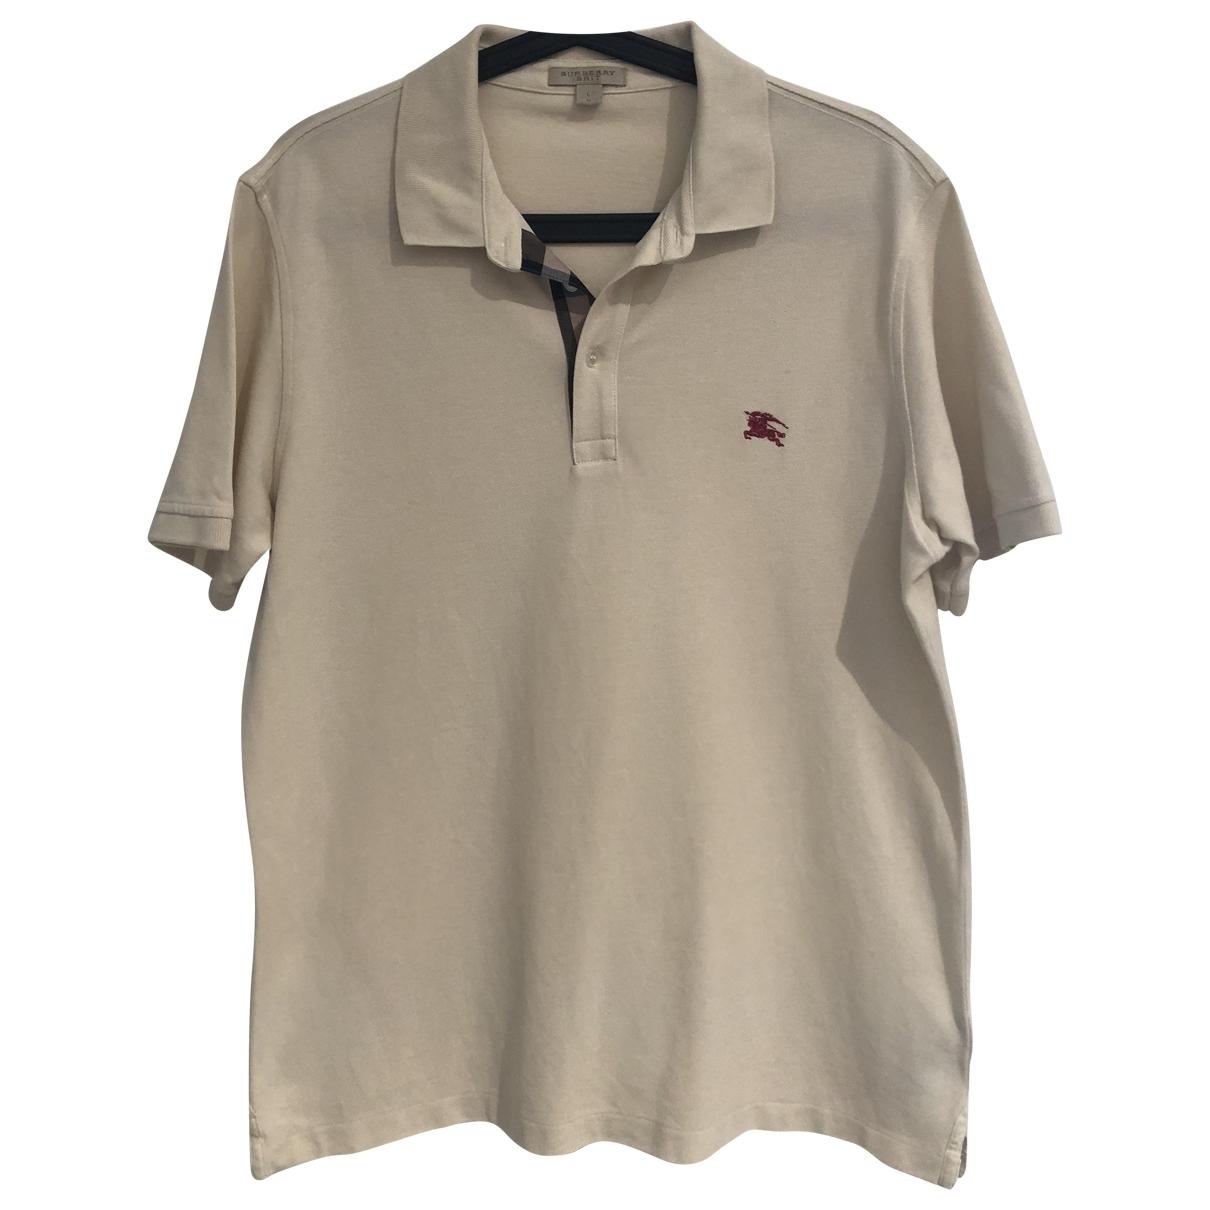 Burberry \N Beige Cotton T-shirts for Men L International